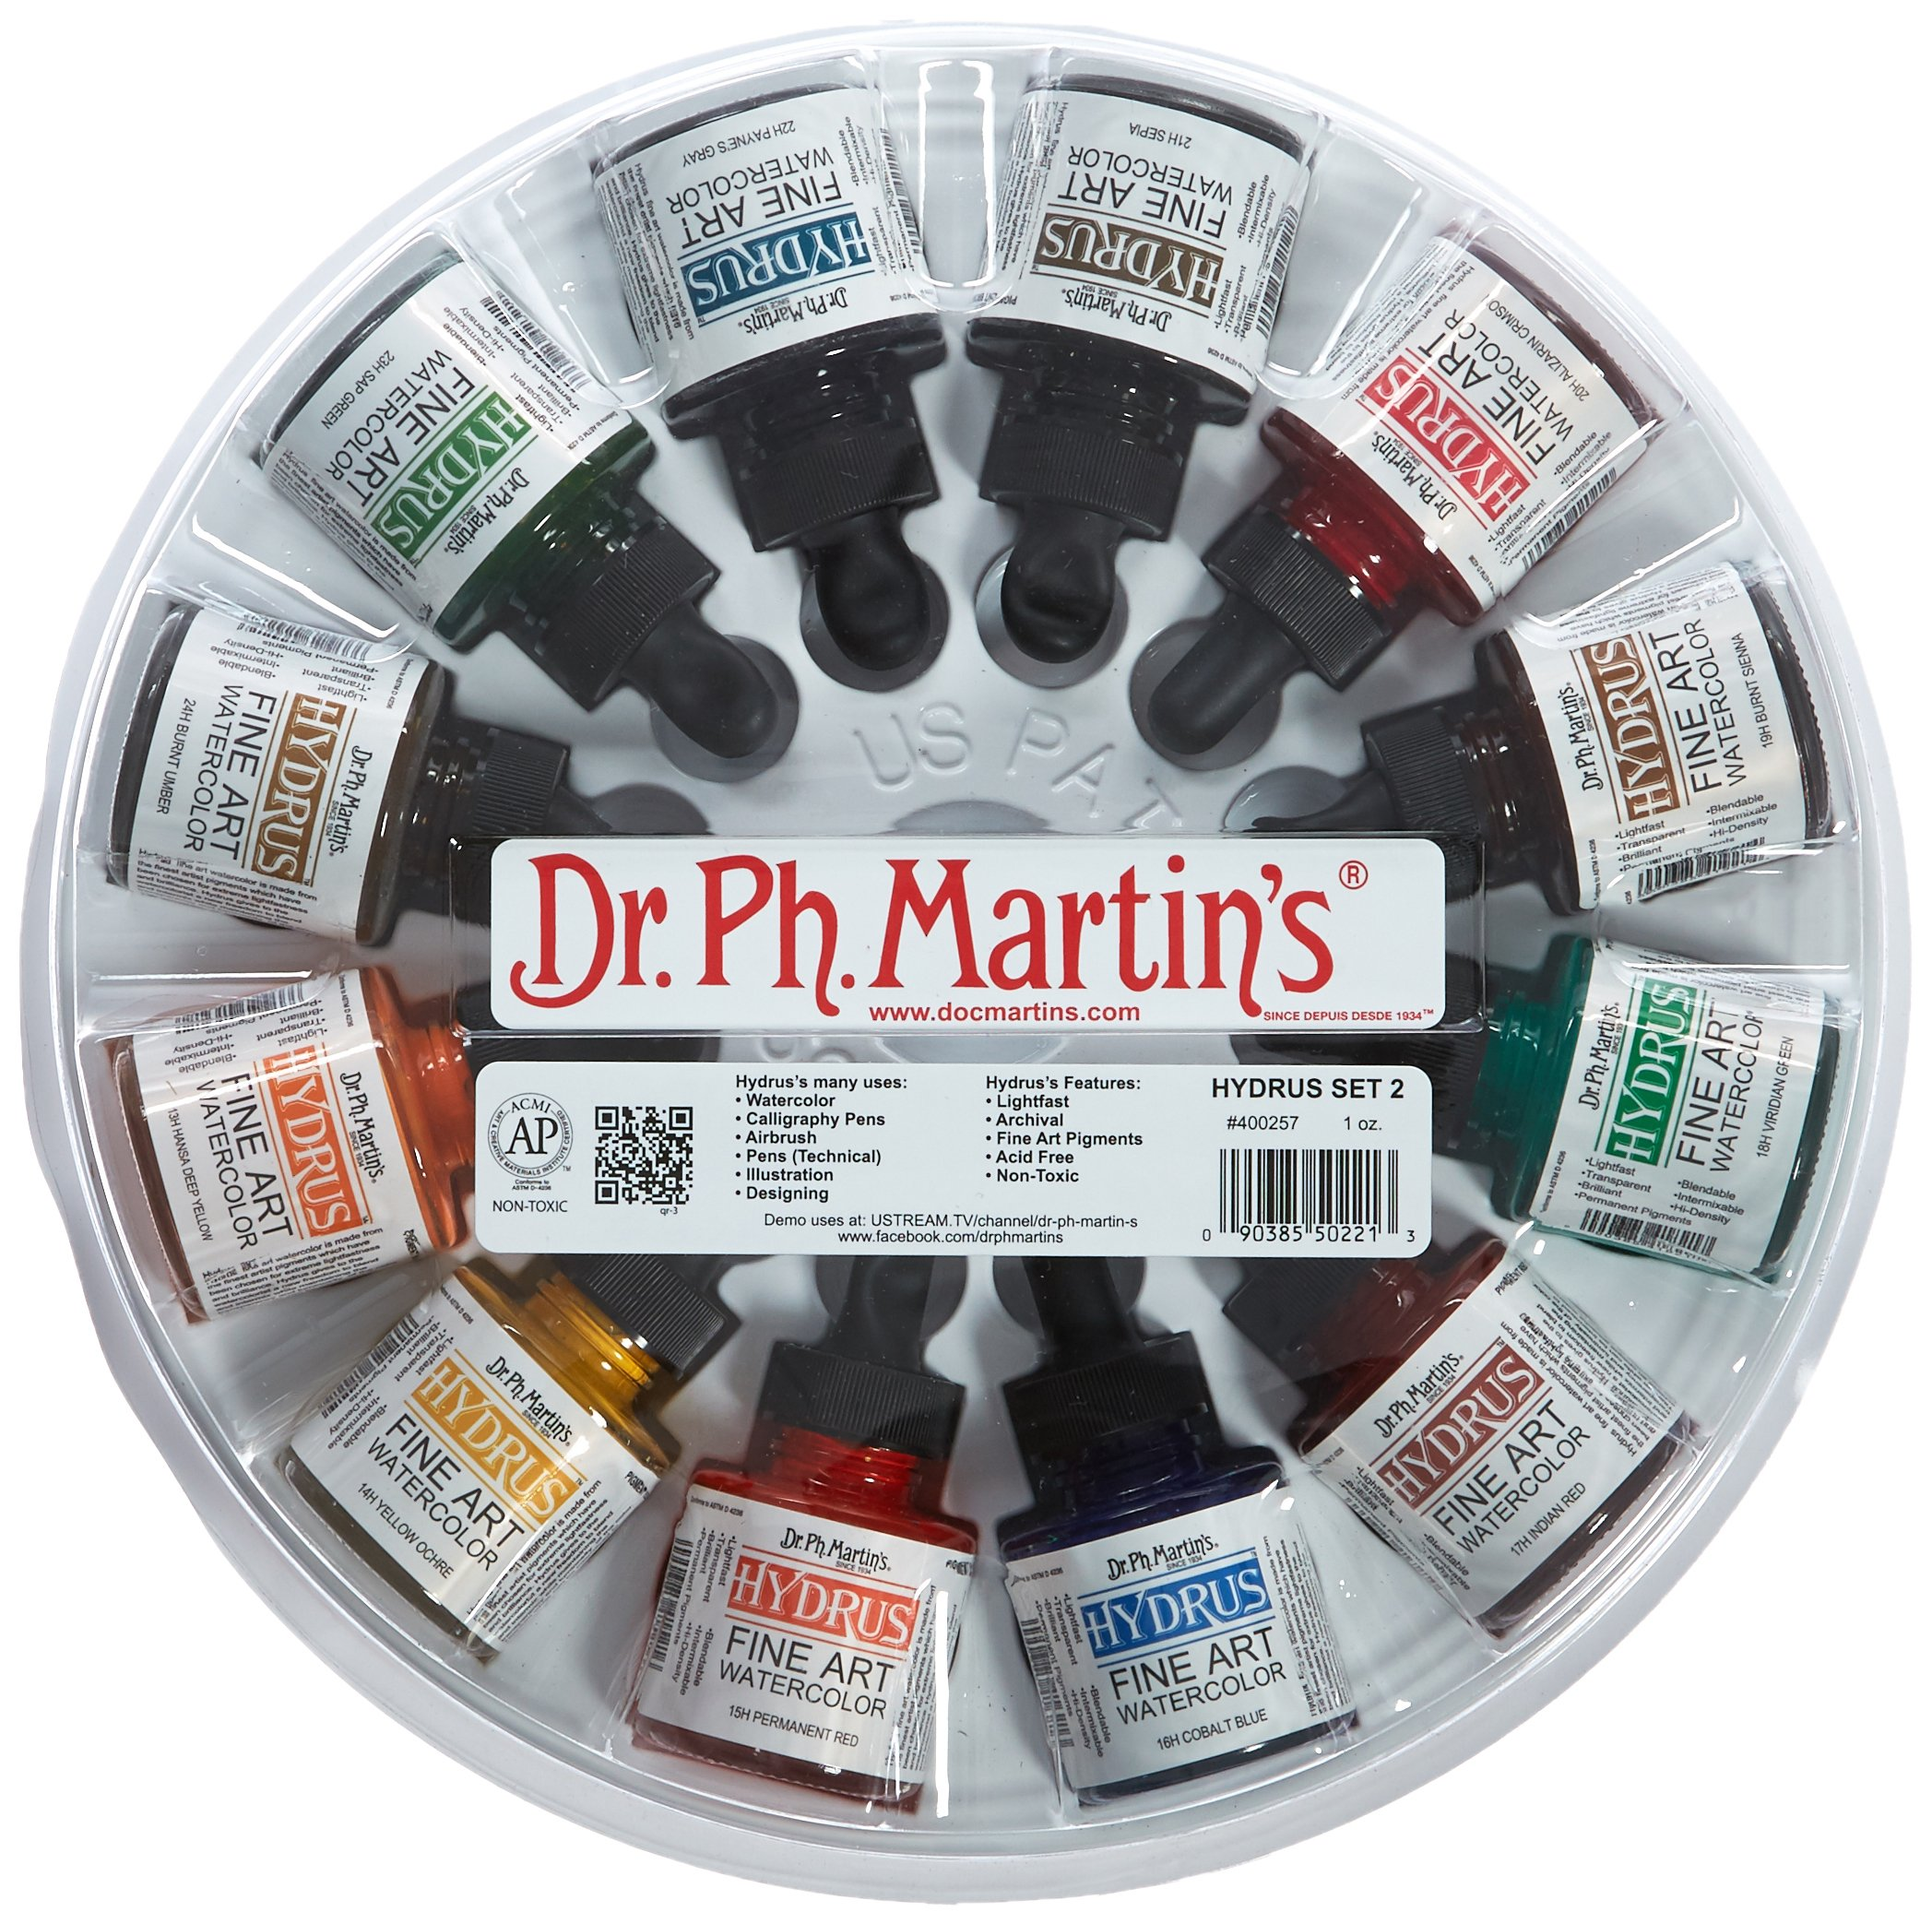 Dr. Ph. Martin's Hydrus Fine Art Watercolor Bottles, 1.0 oz, Set of 12